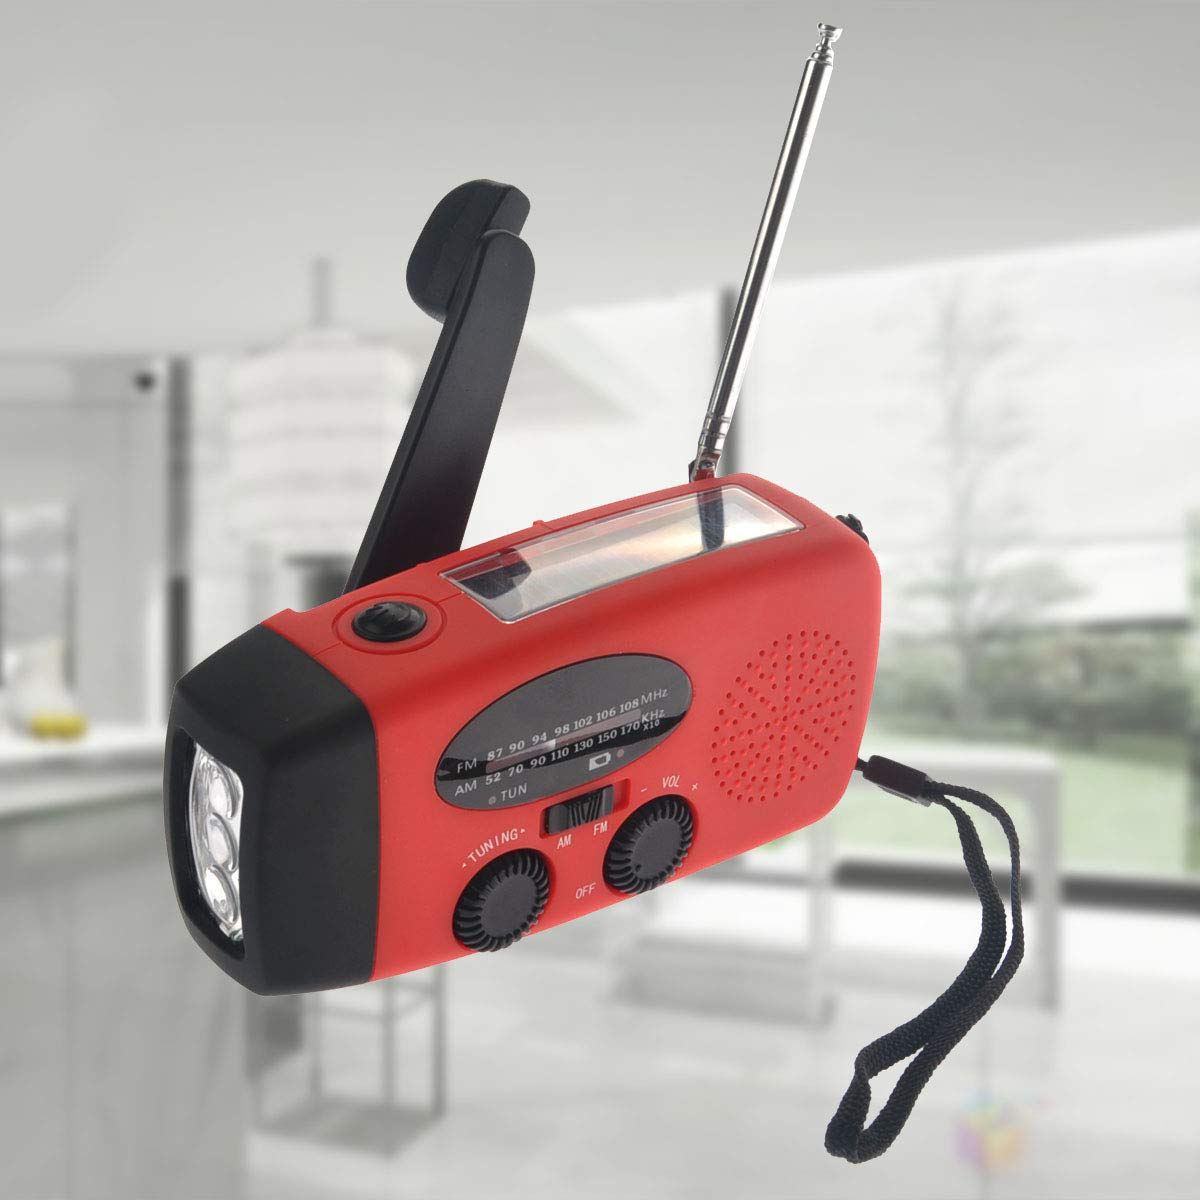 VOSAREA Emergency Solar Crank AM FM Camp Radio with LED Flashlight USB Output Port(Red) by VOSAREA (Image #4)